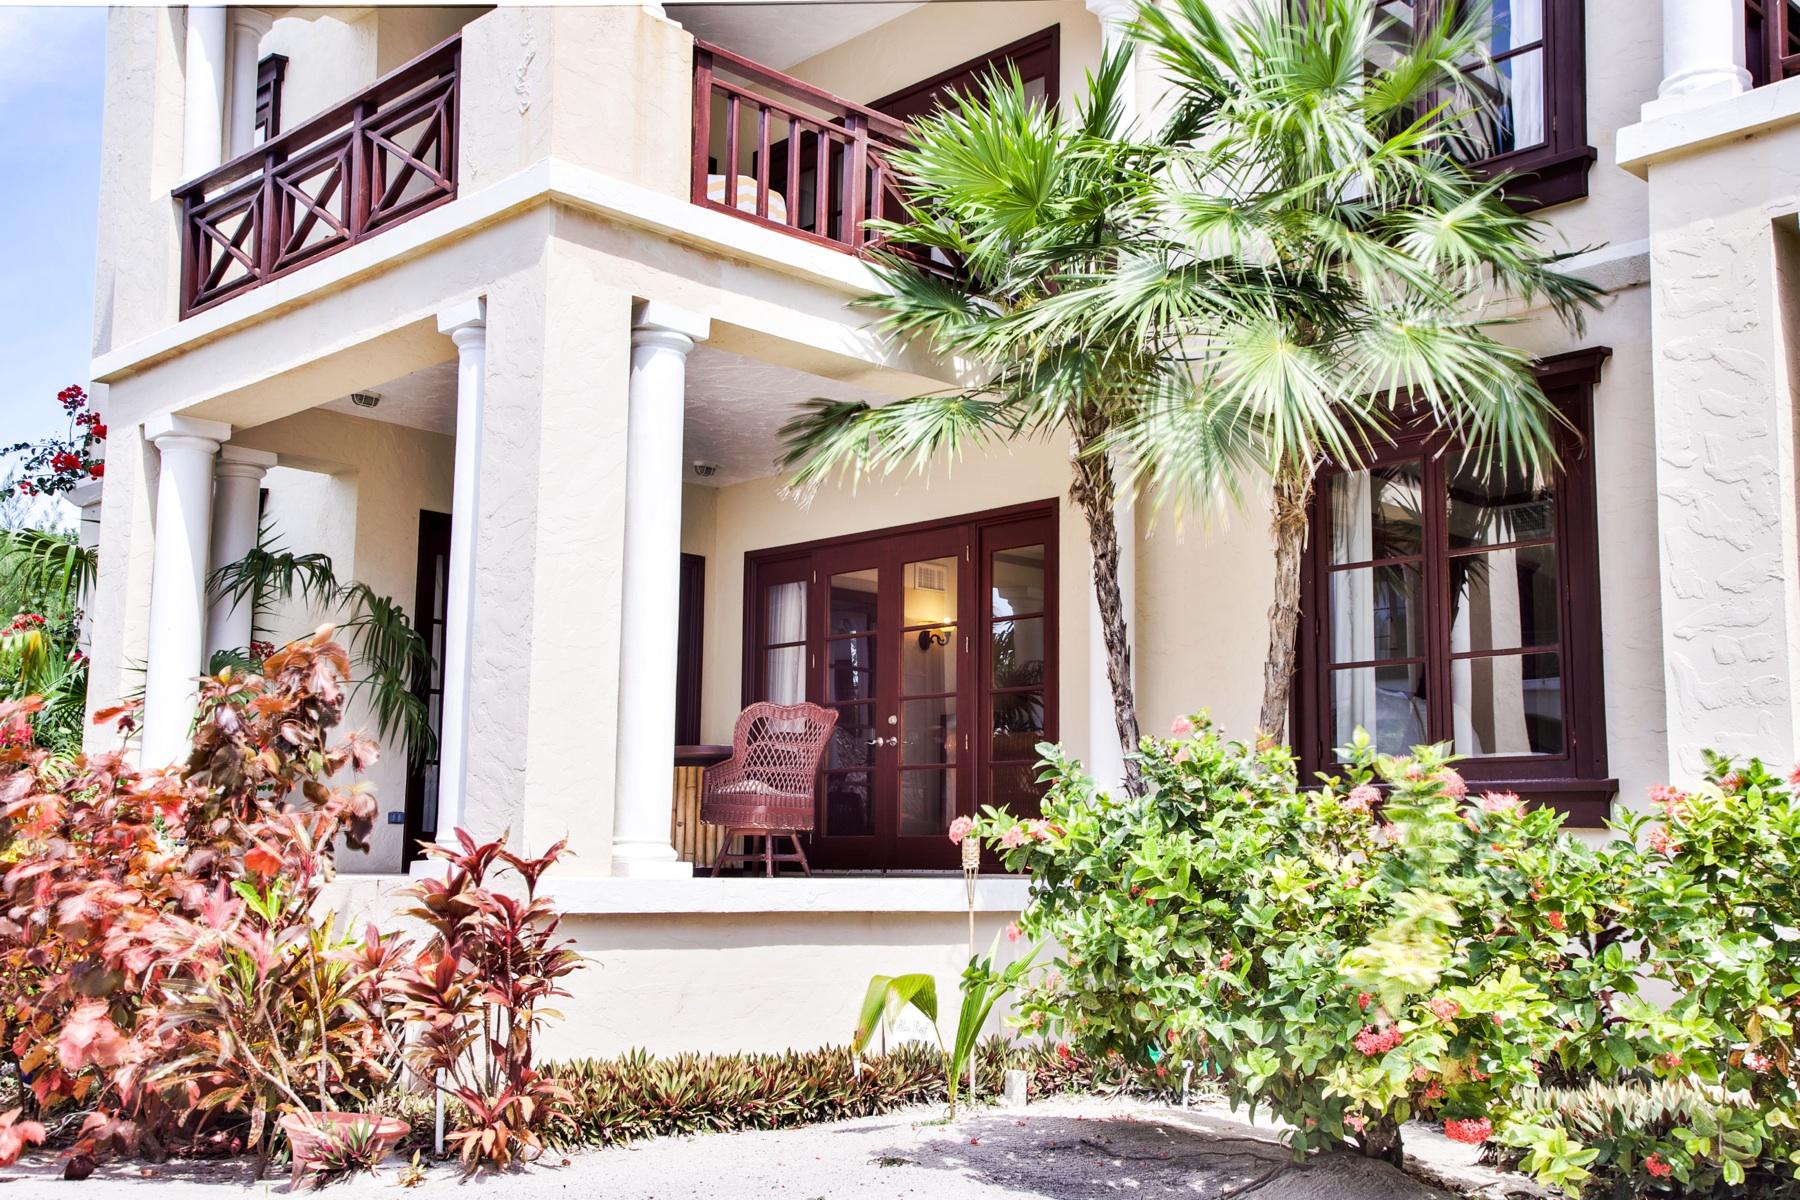 Single Family Home for Sale at La Beliza 202,Sunfish. San Pedro Town, Ambergris Caye, Belize